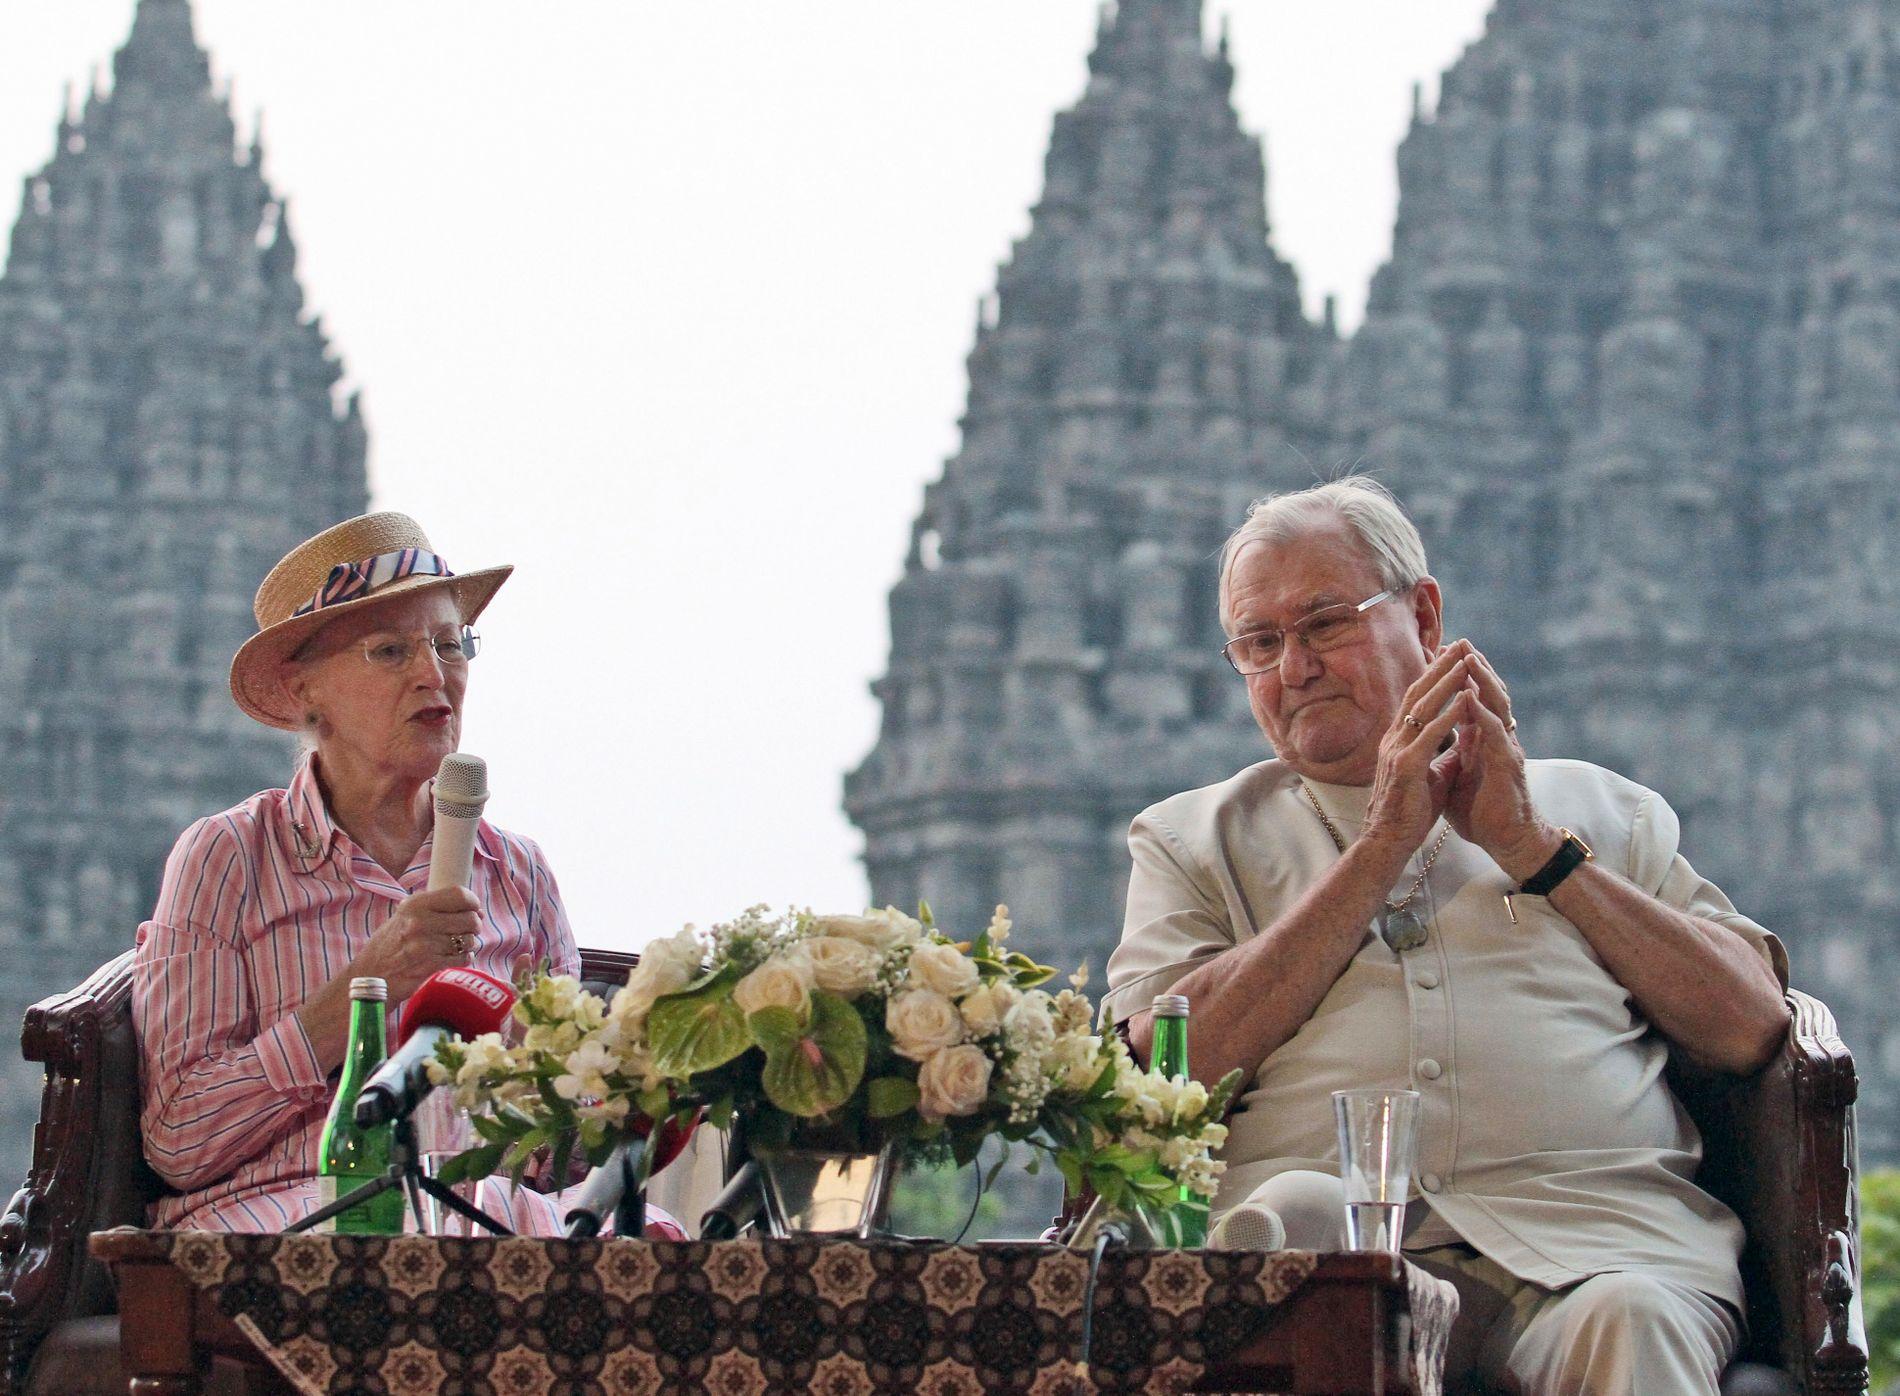 Dronning Margrethe og prins Henrik ved Prambanan i Yogyakarta i Indonesia i 2015.